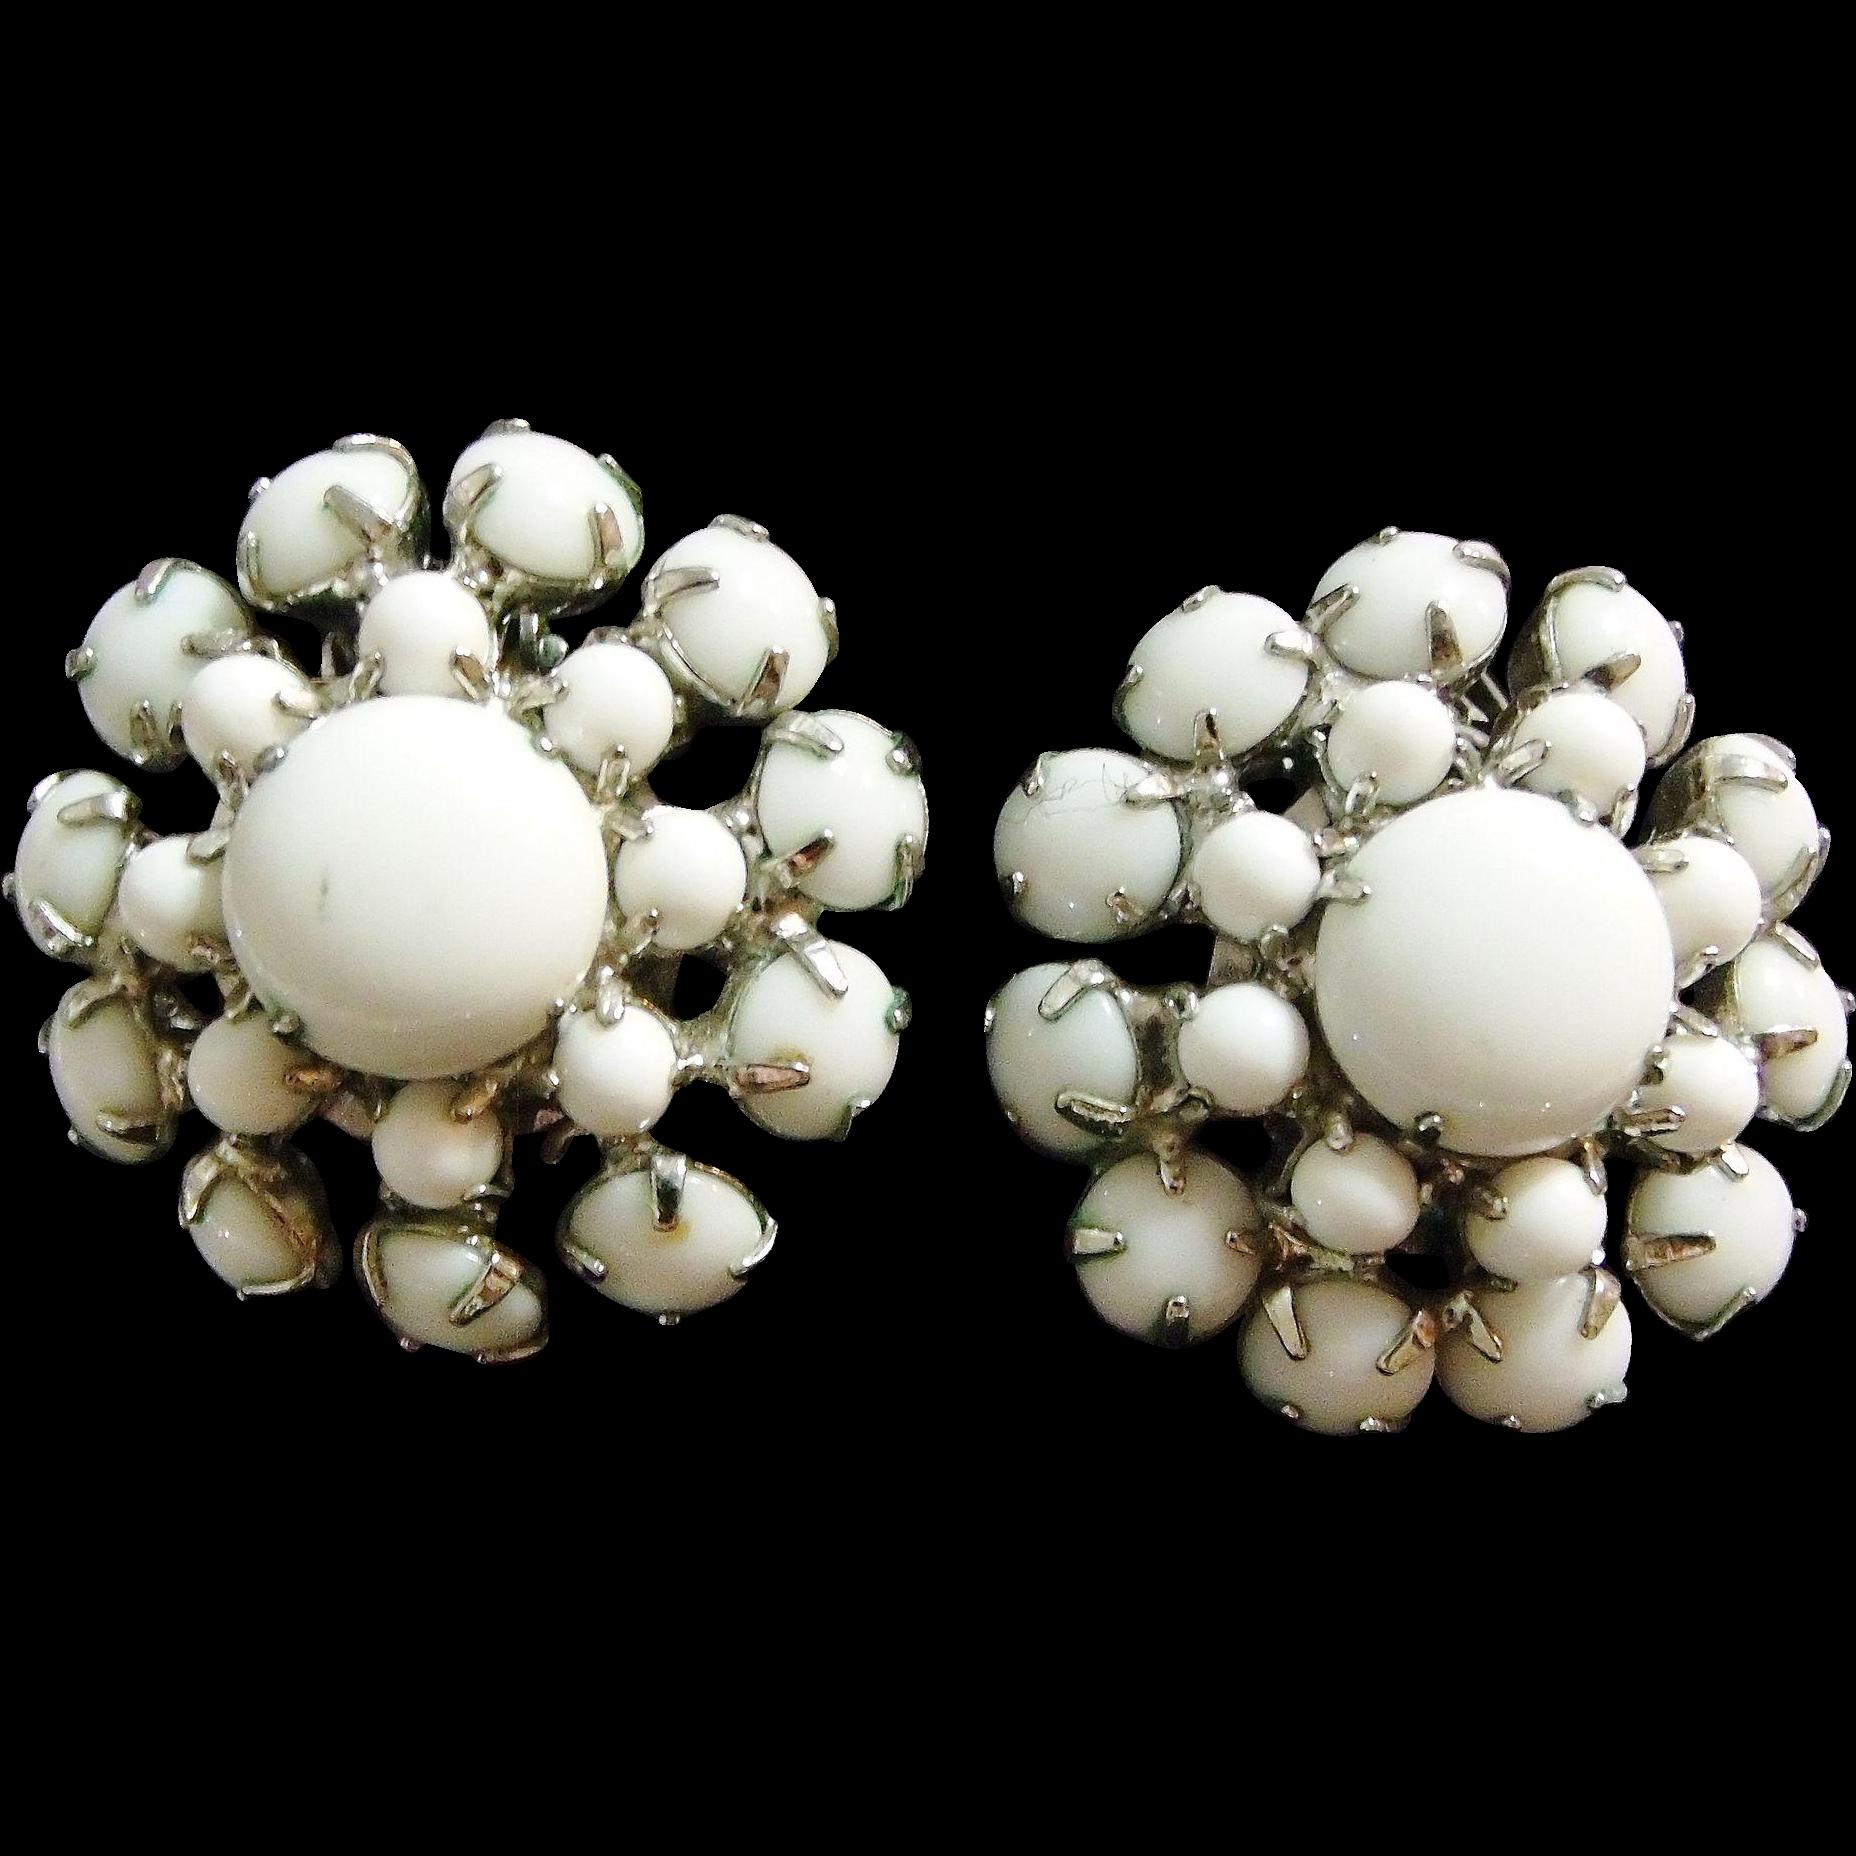 Nice White/Milk Glass Vintage Clip on Earrings